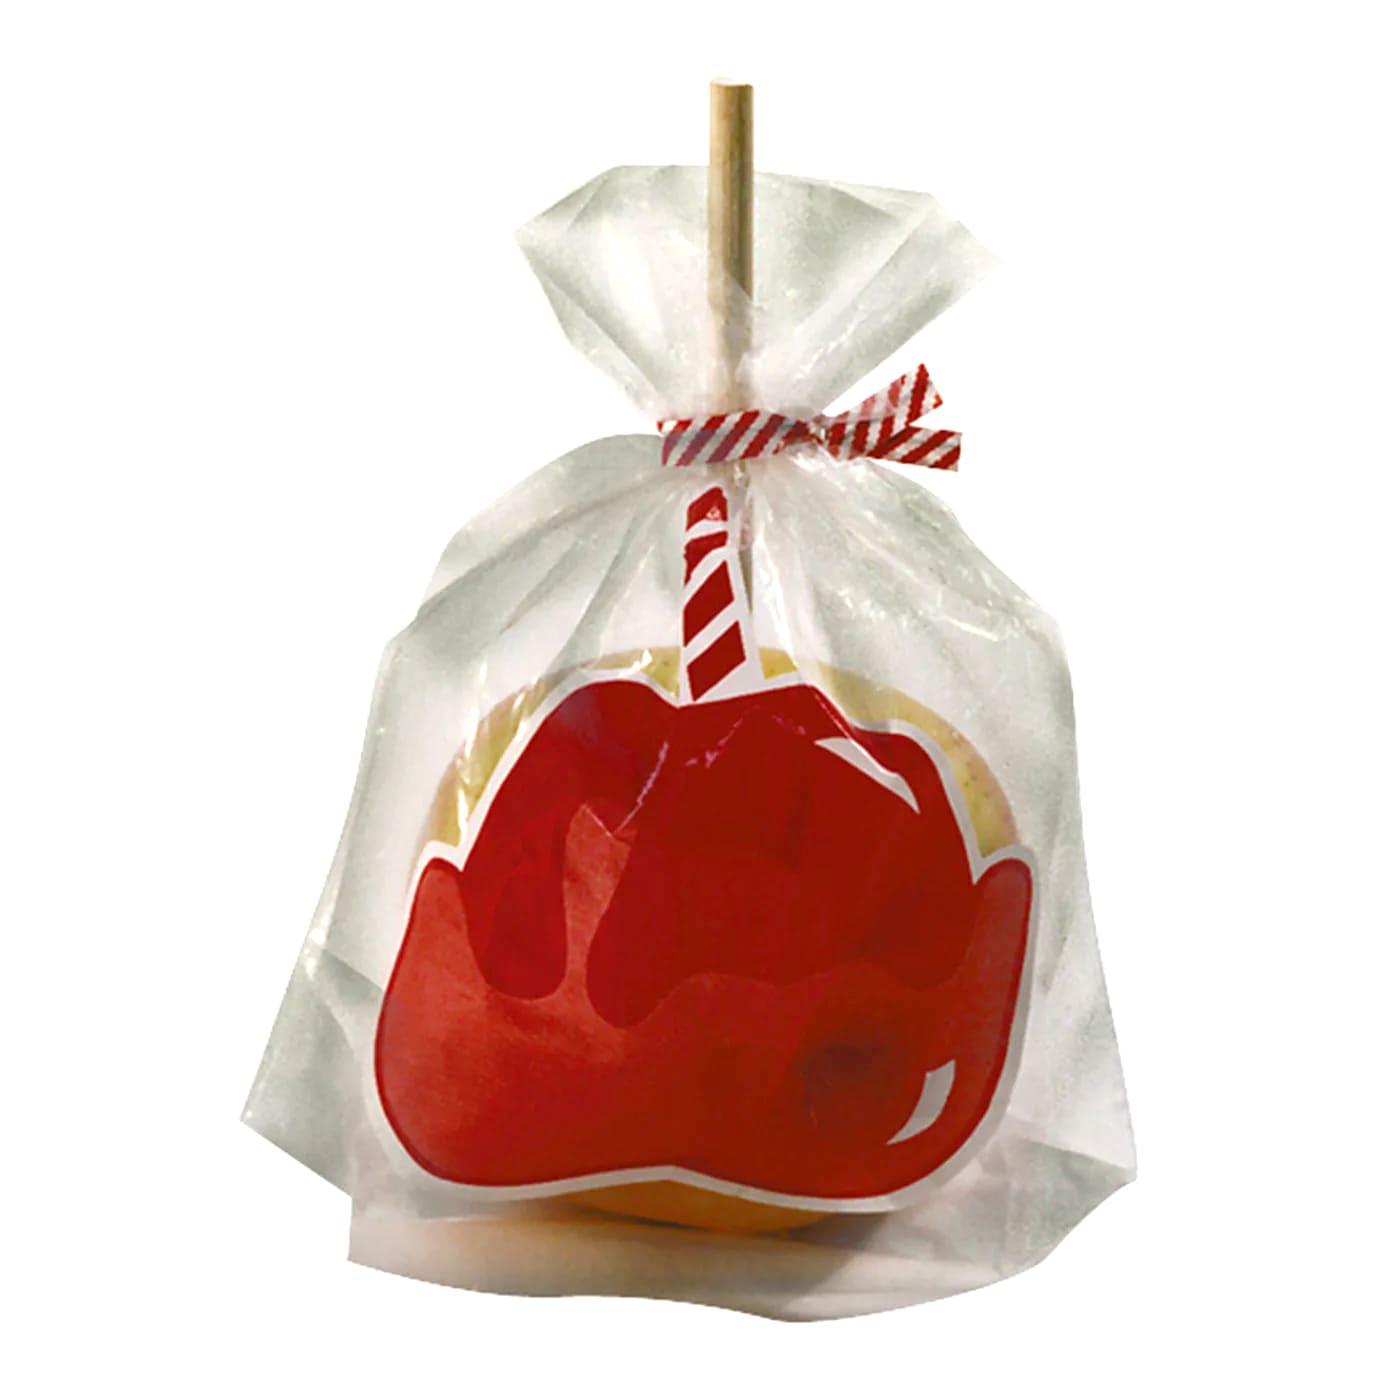 Gold Medal 4007 Satchel Bottom Candy Apple Bags, 1,000/Case